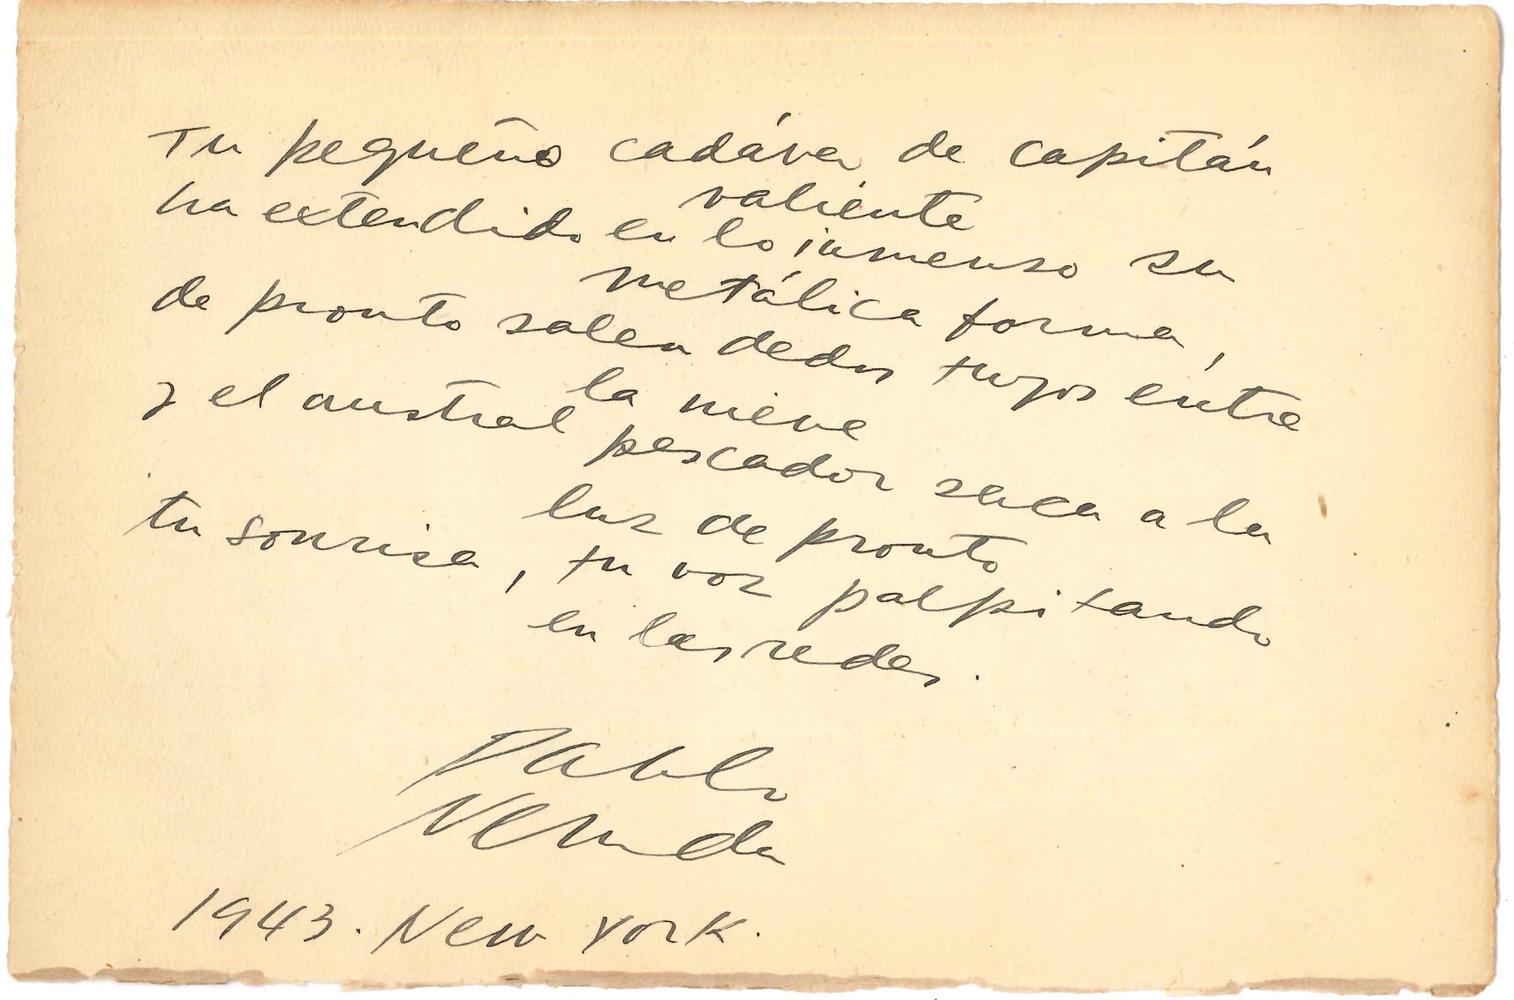 pablo-neruda-1904-1973-poeme-autographe-signe-un-canto-para-bolivar-new-york-1943-1-page-oblong-in-8-portant-au-dos-une-p-a-s-musicale-darthur-rubinstein-deuxieme-strophe-du-celebre-poeme-un-canto-para-bolivar-lu-par-neruda--198